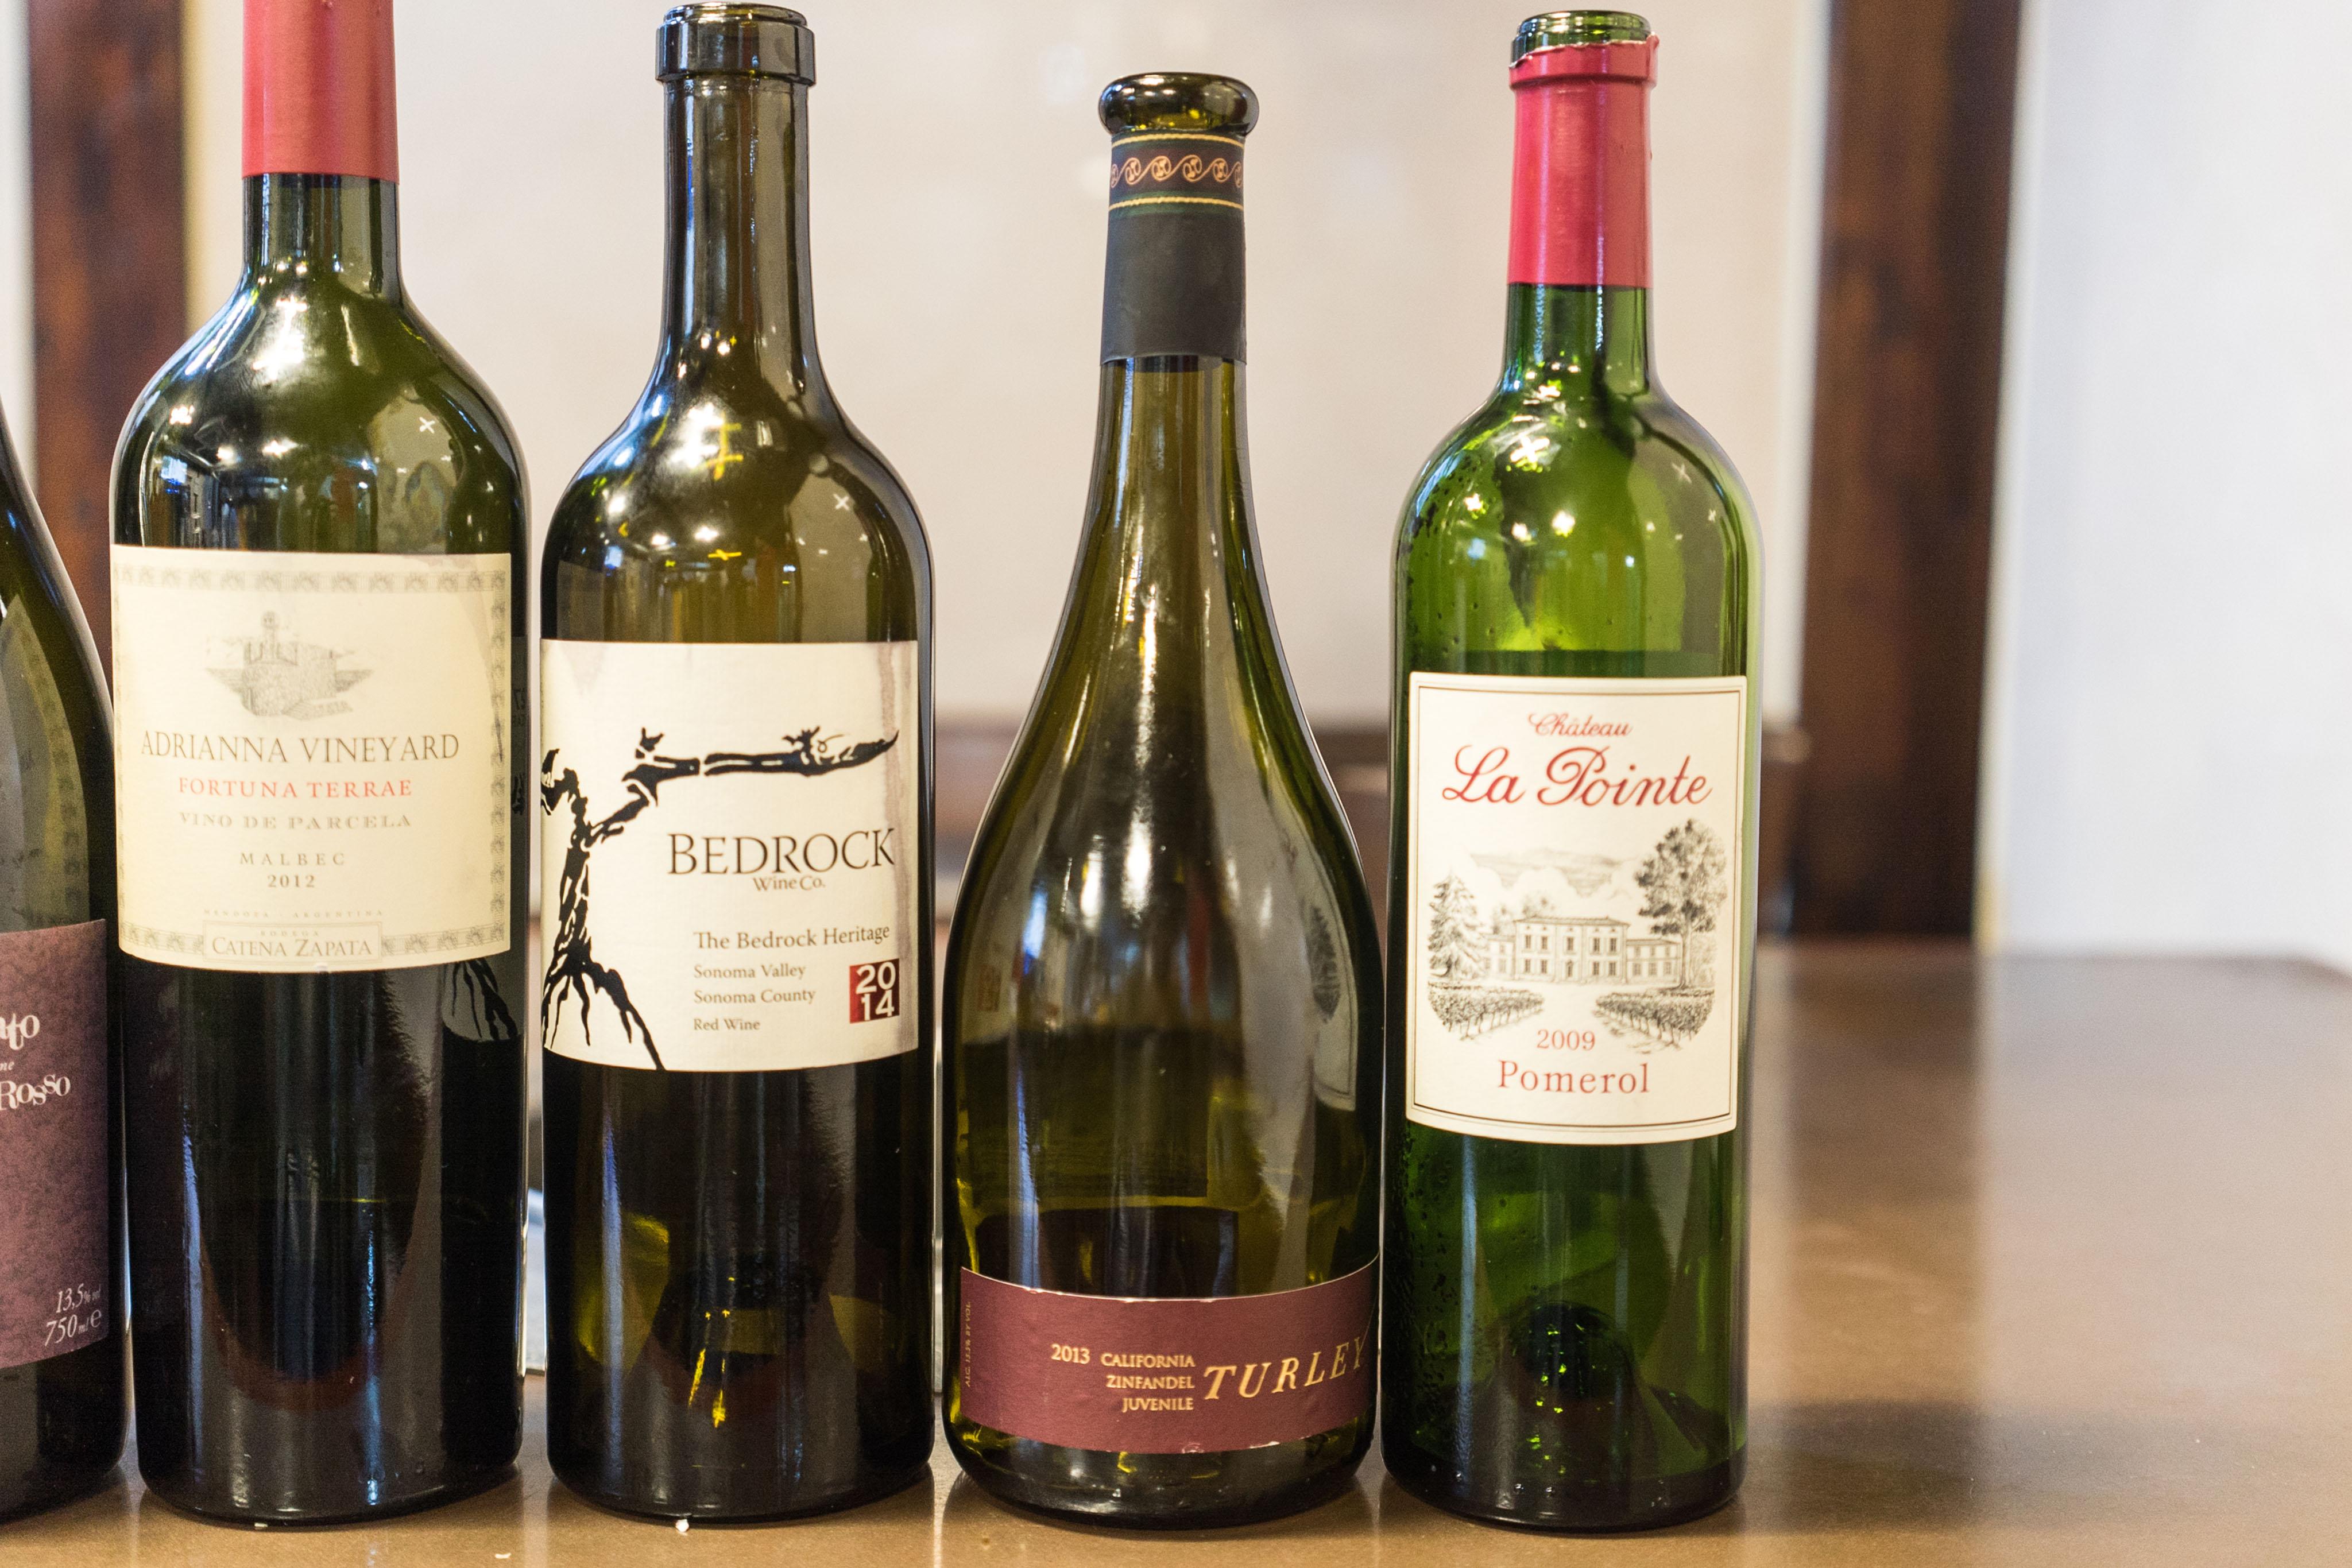 Turley Wine Cellars Juvenile Zinfandel 2013